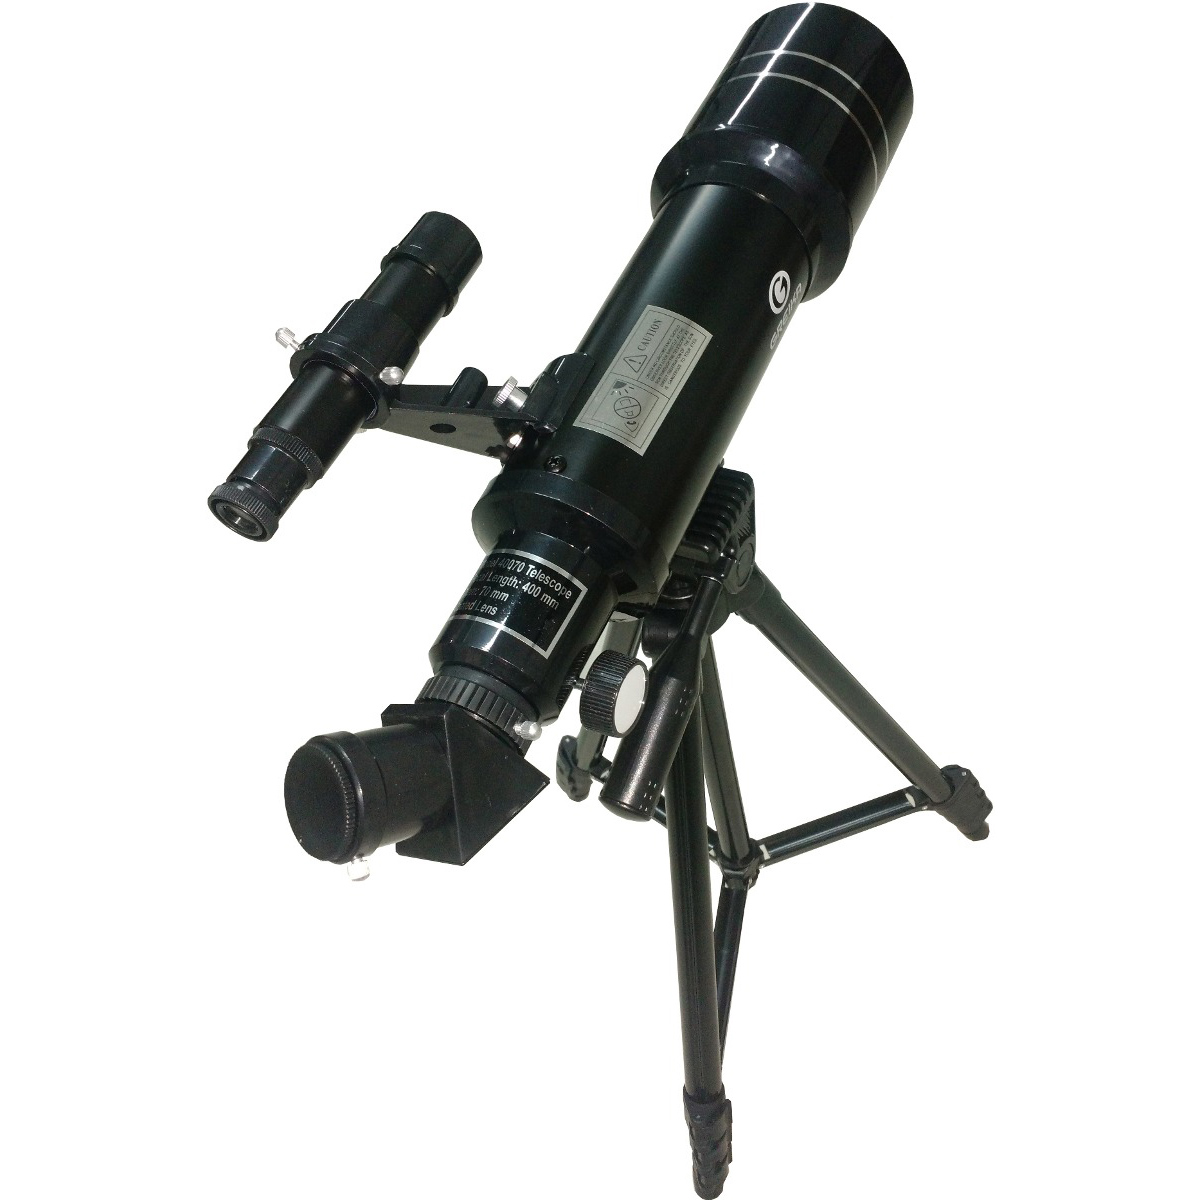 Telescópio Refrator Azimutal 40070m Luneta Lente 400mm 70mm